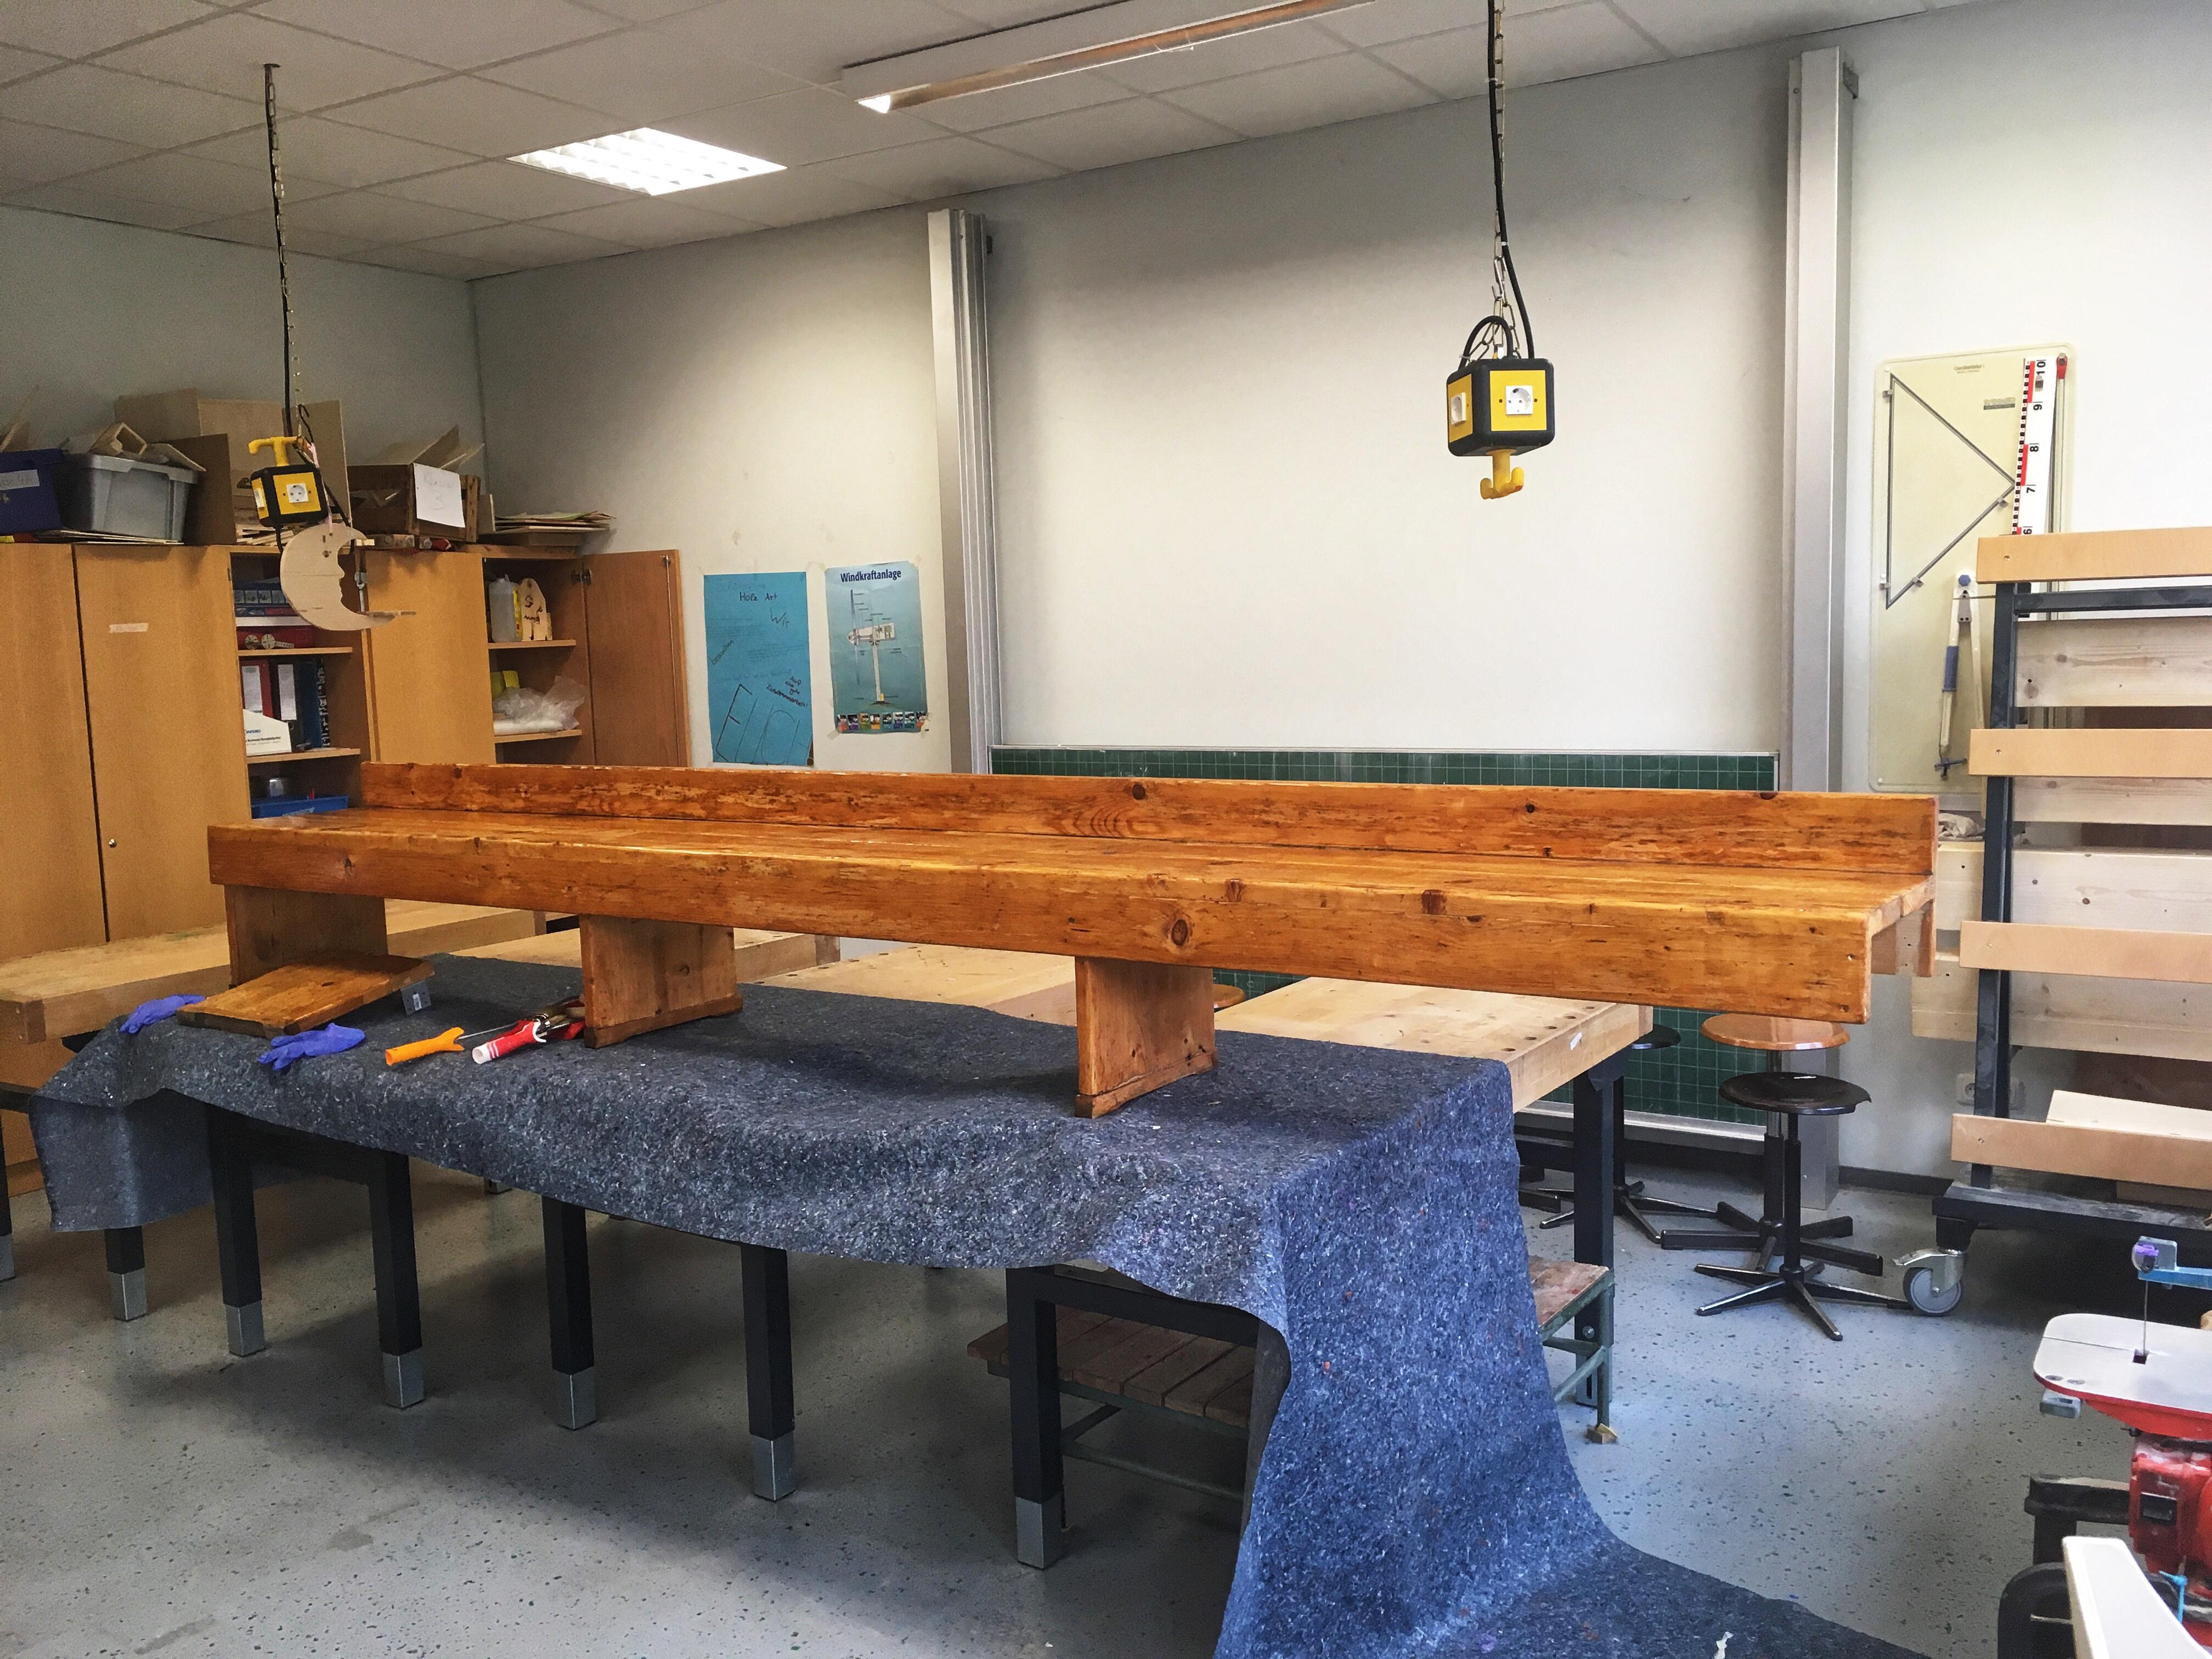 Umkleidebänke bearbeitet – Freie Schule Bochum